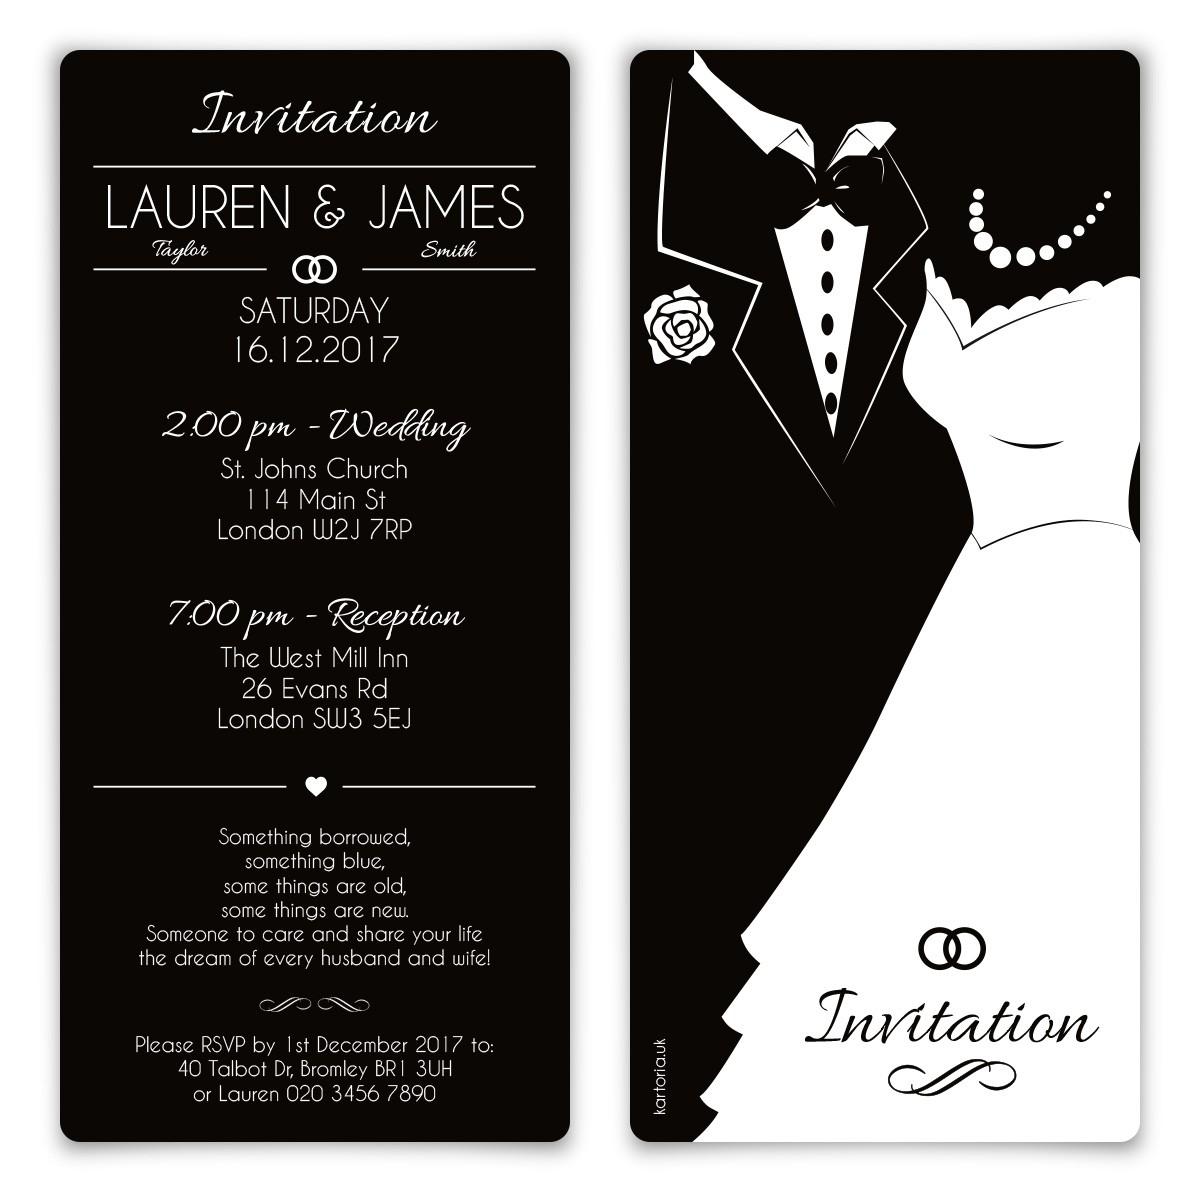 Black And White Wedding Invitations Wedding Invitation Cards Black And White Bride And Groom Black